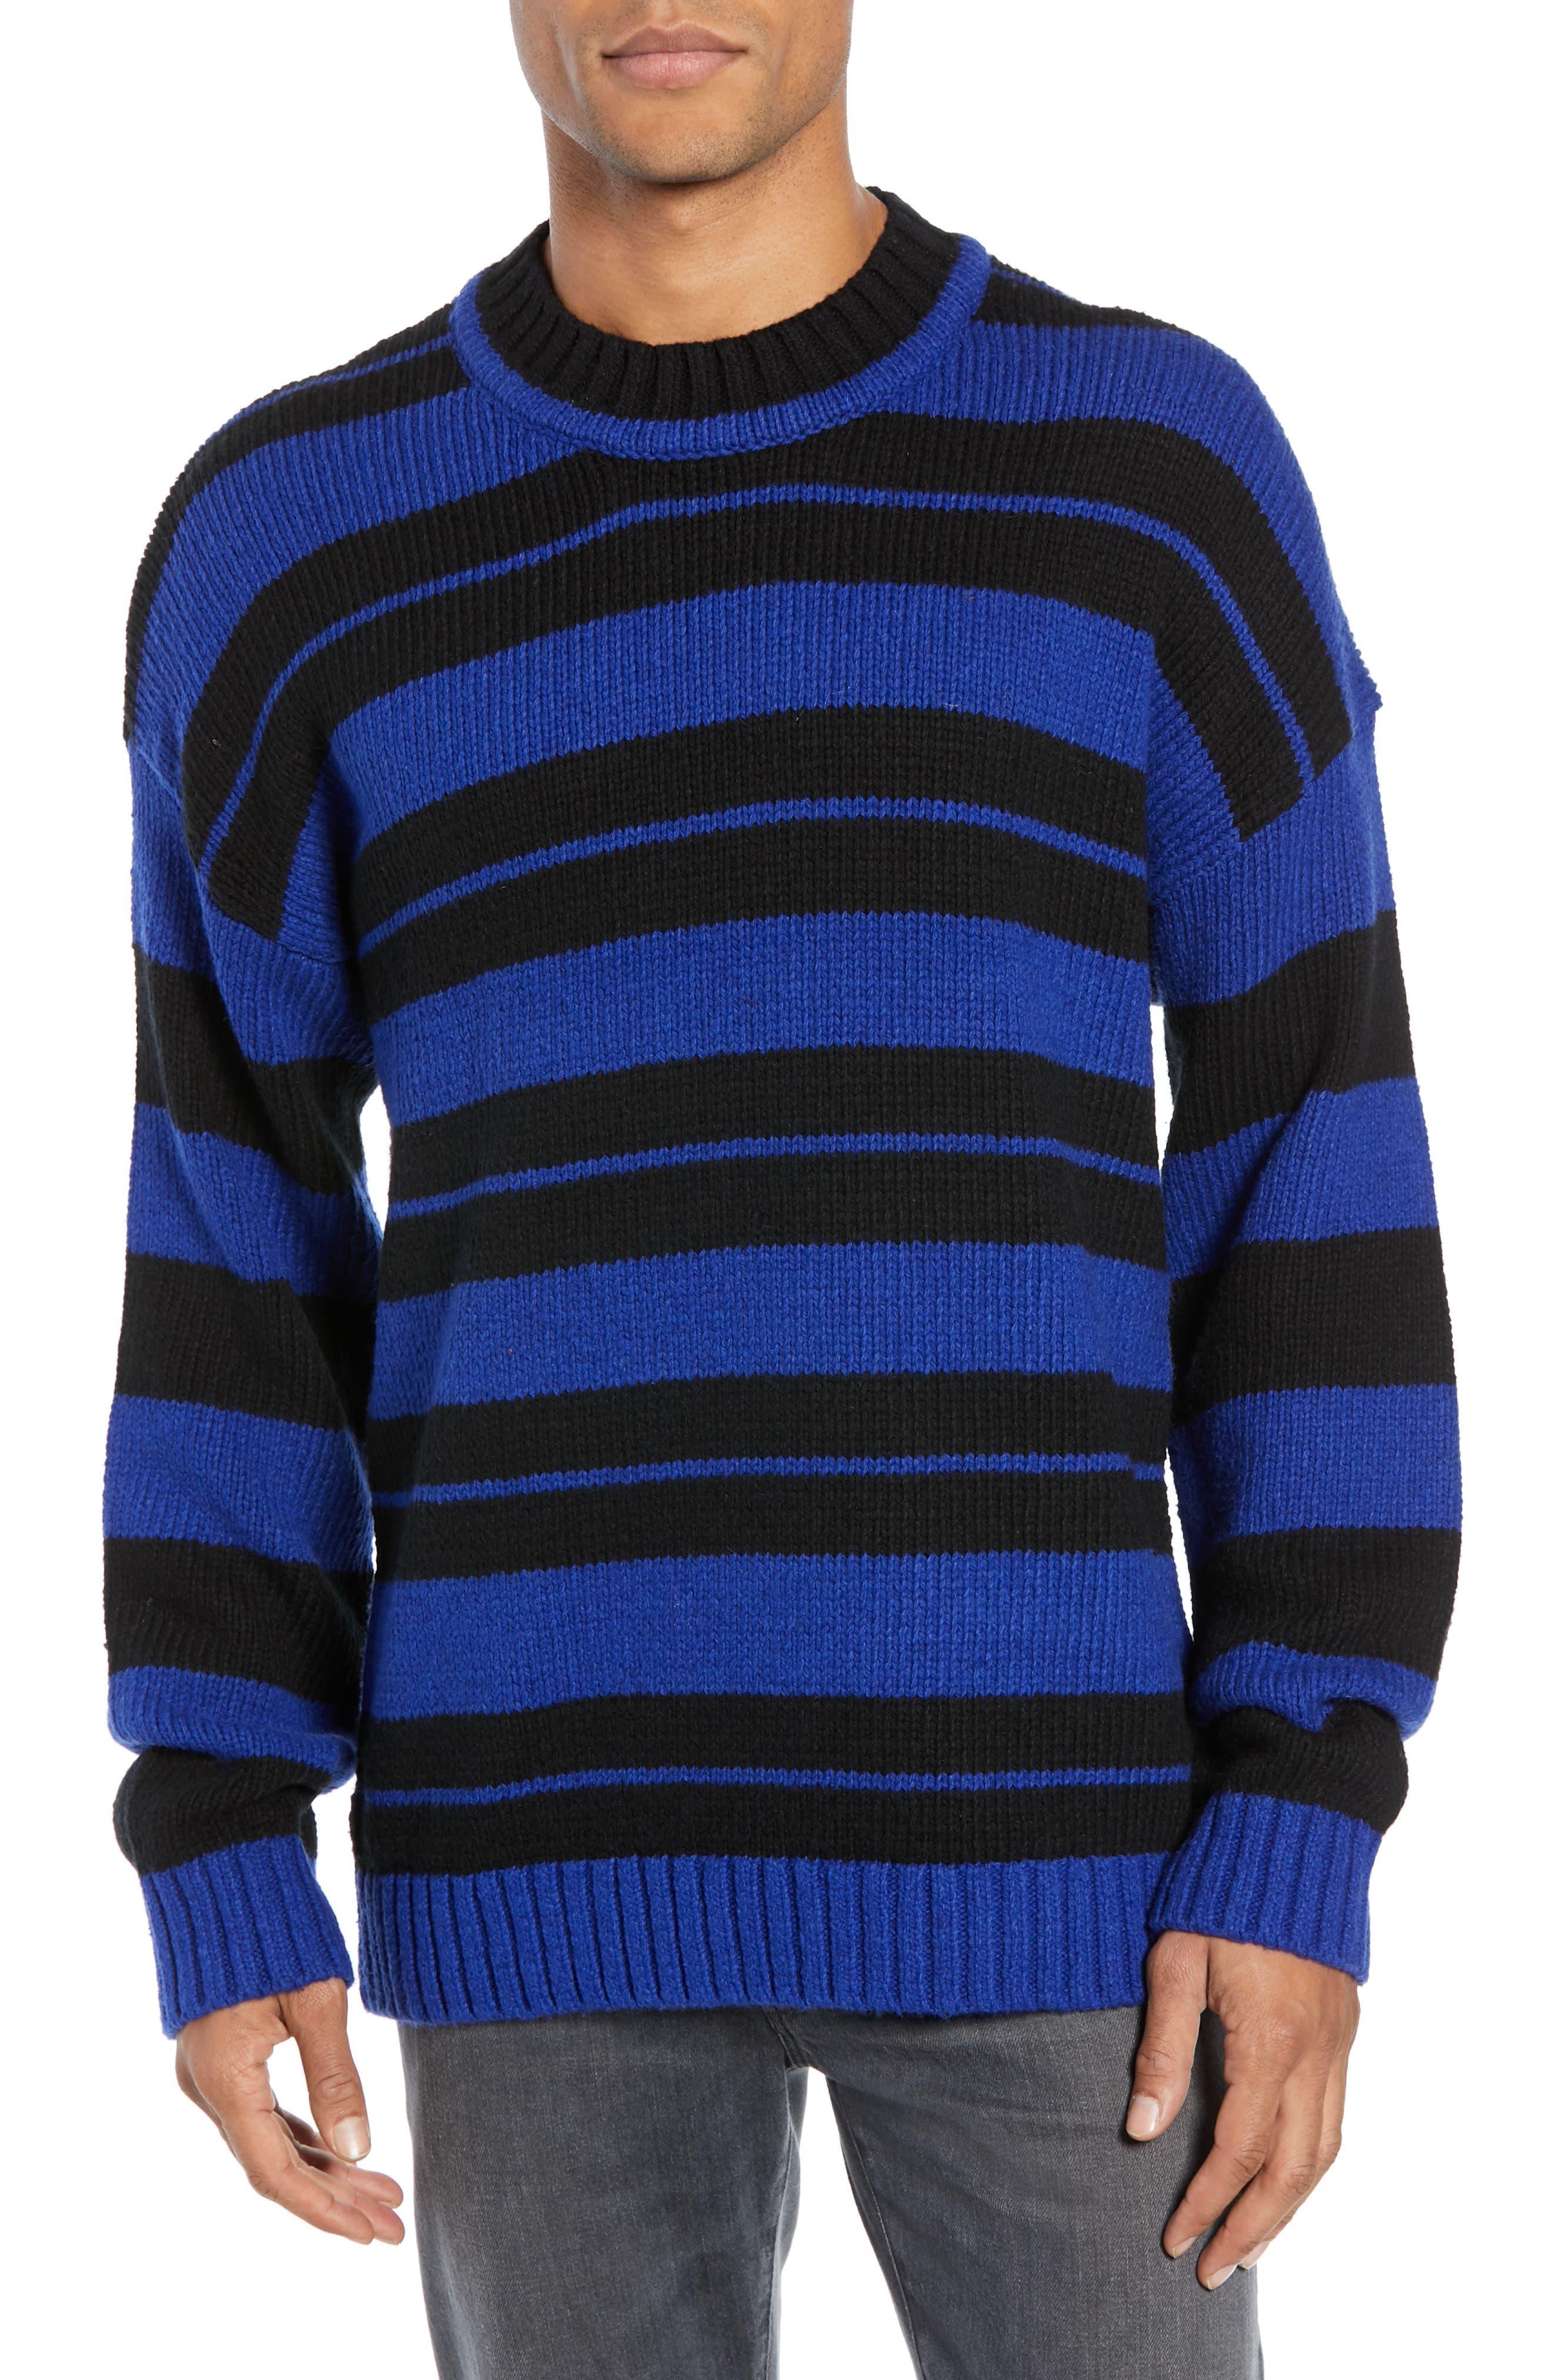 Regular Fit Varsity Stripe Sweater,                             Main thumbnail 1, color,                             FLURO BLUE BLACK